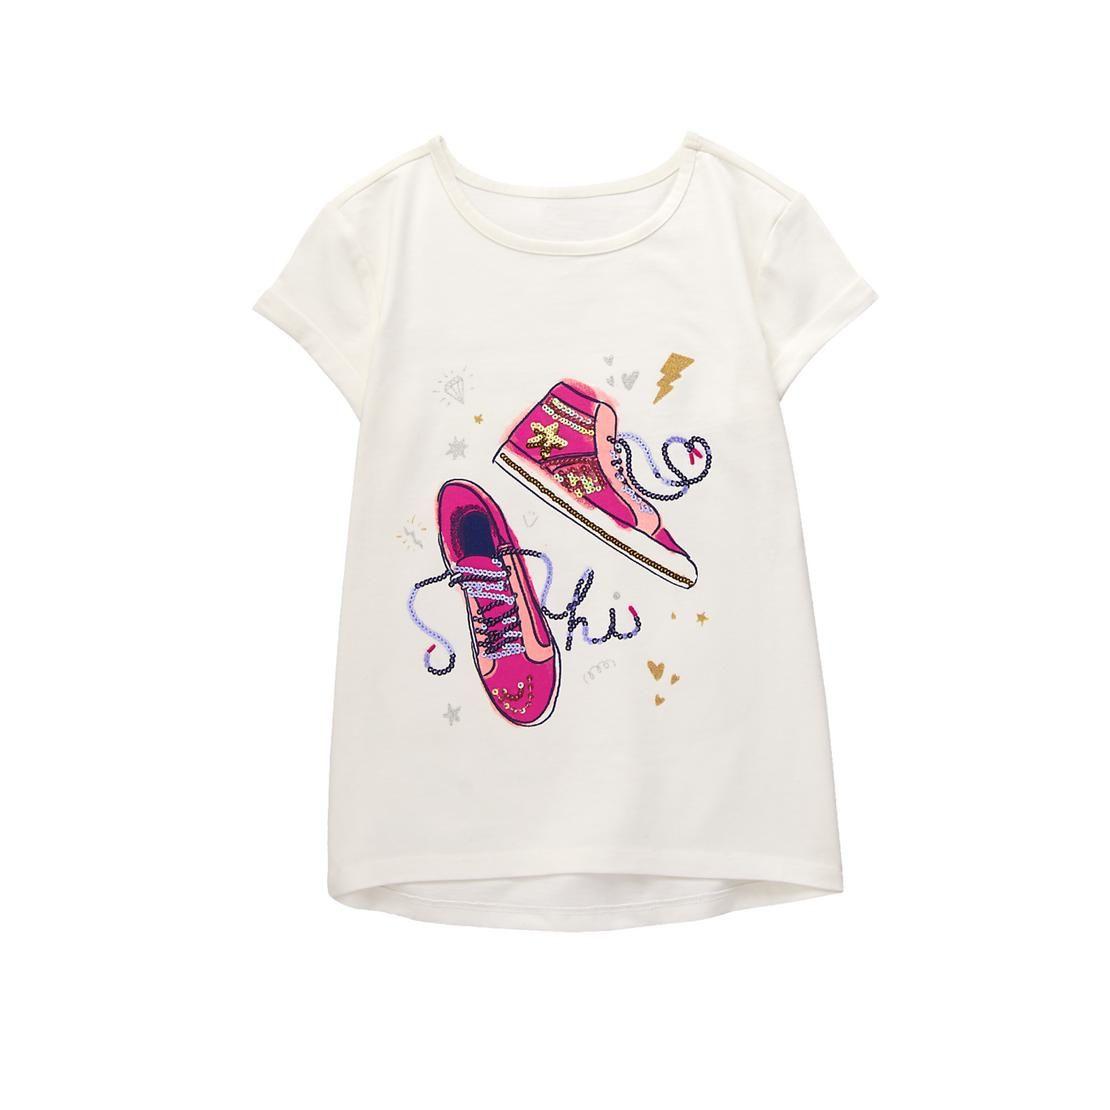 NEW Gymboree girls summer short sleeve tee size 4 5 6 7 8 NWT you pick beach